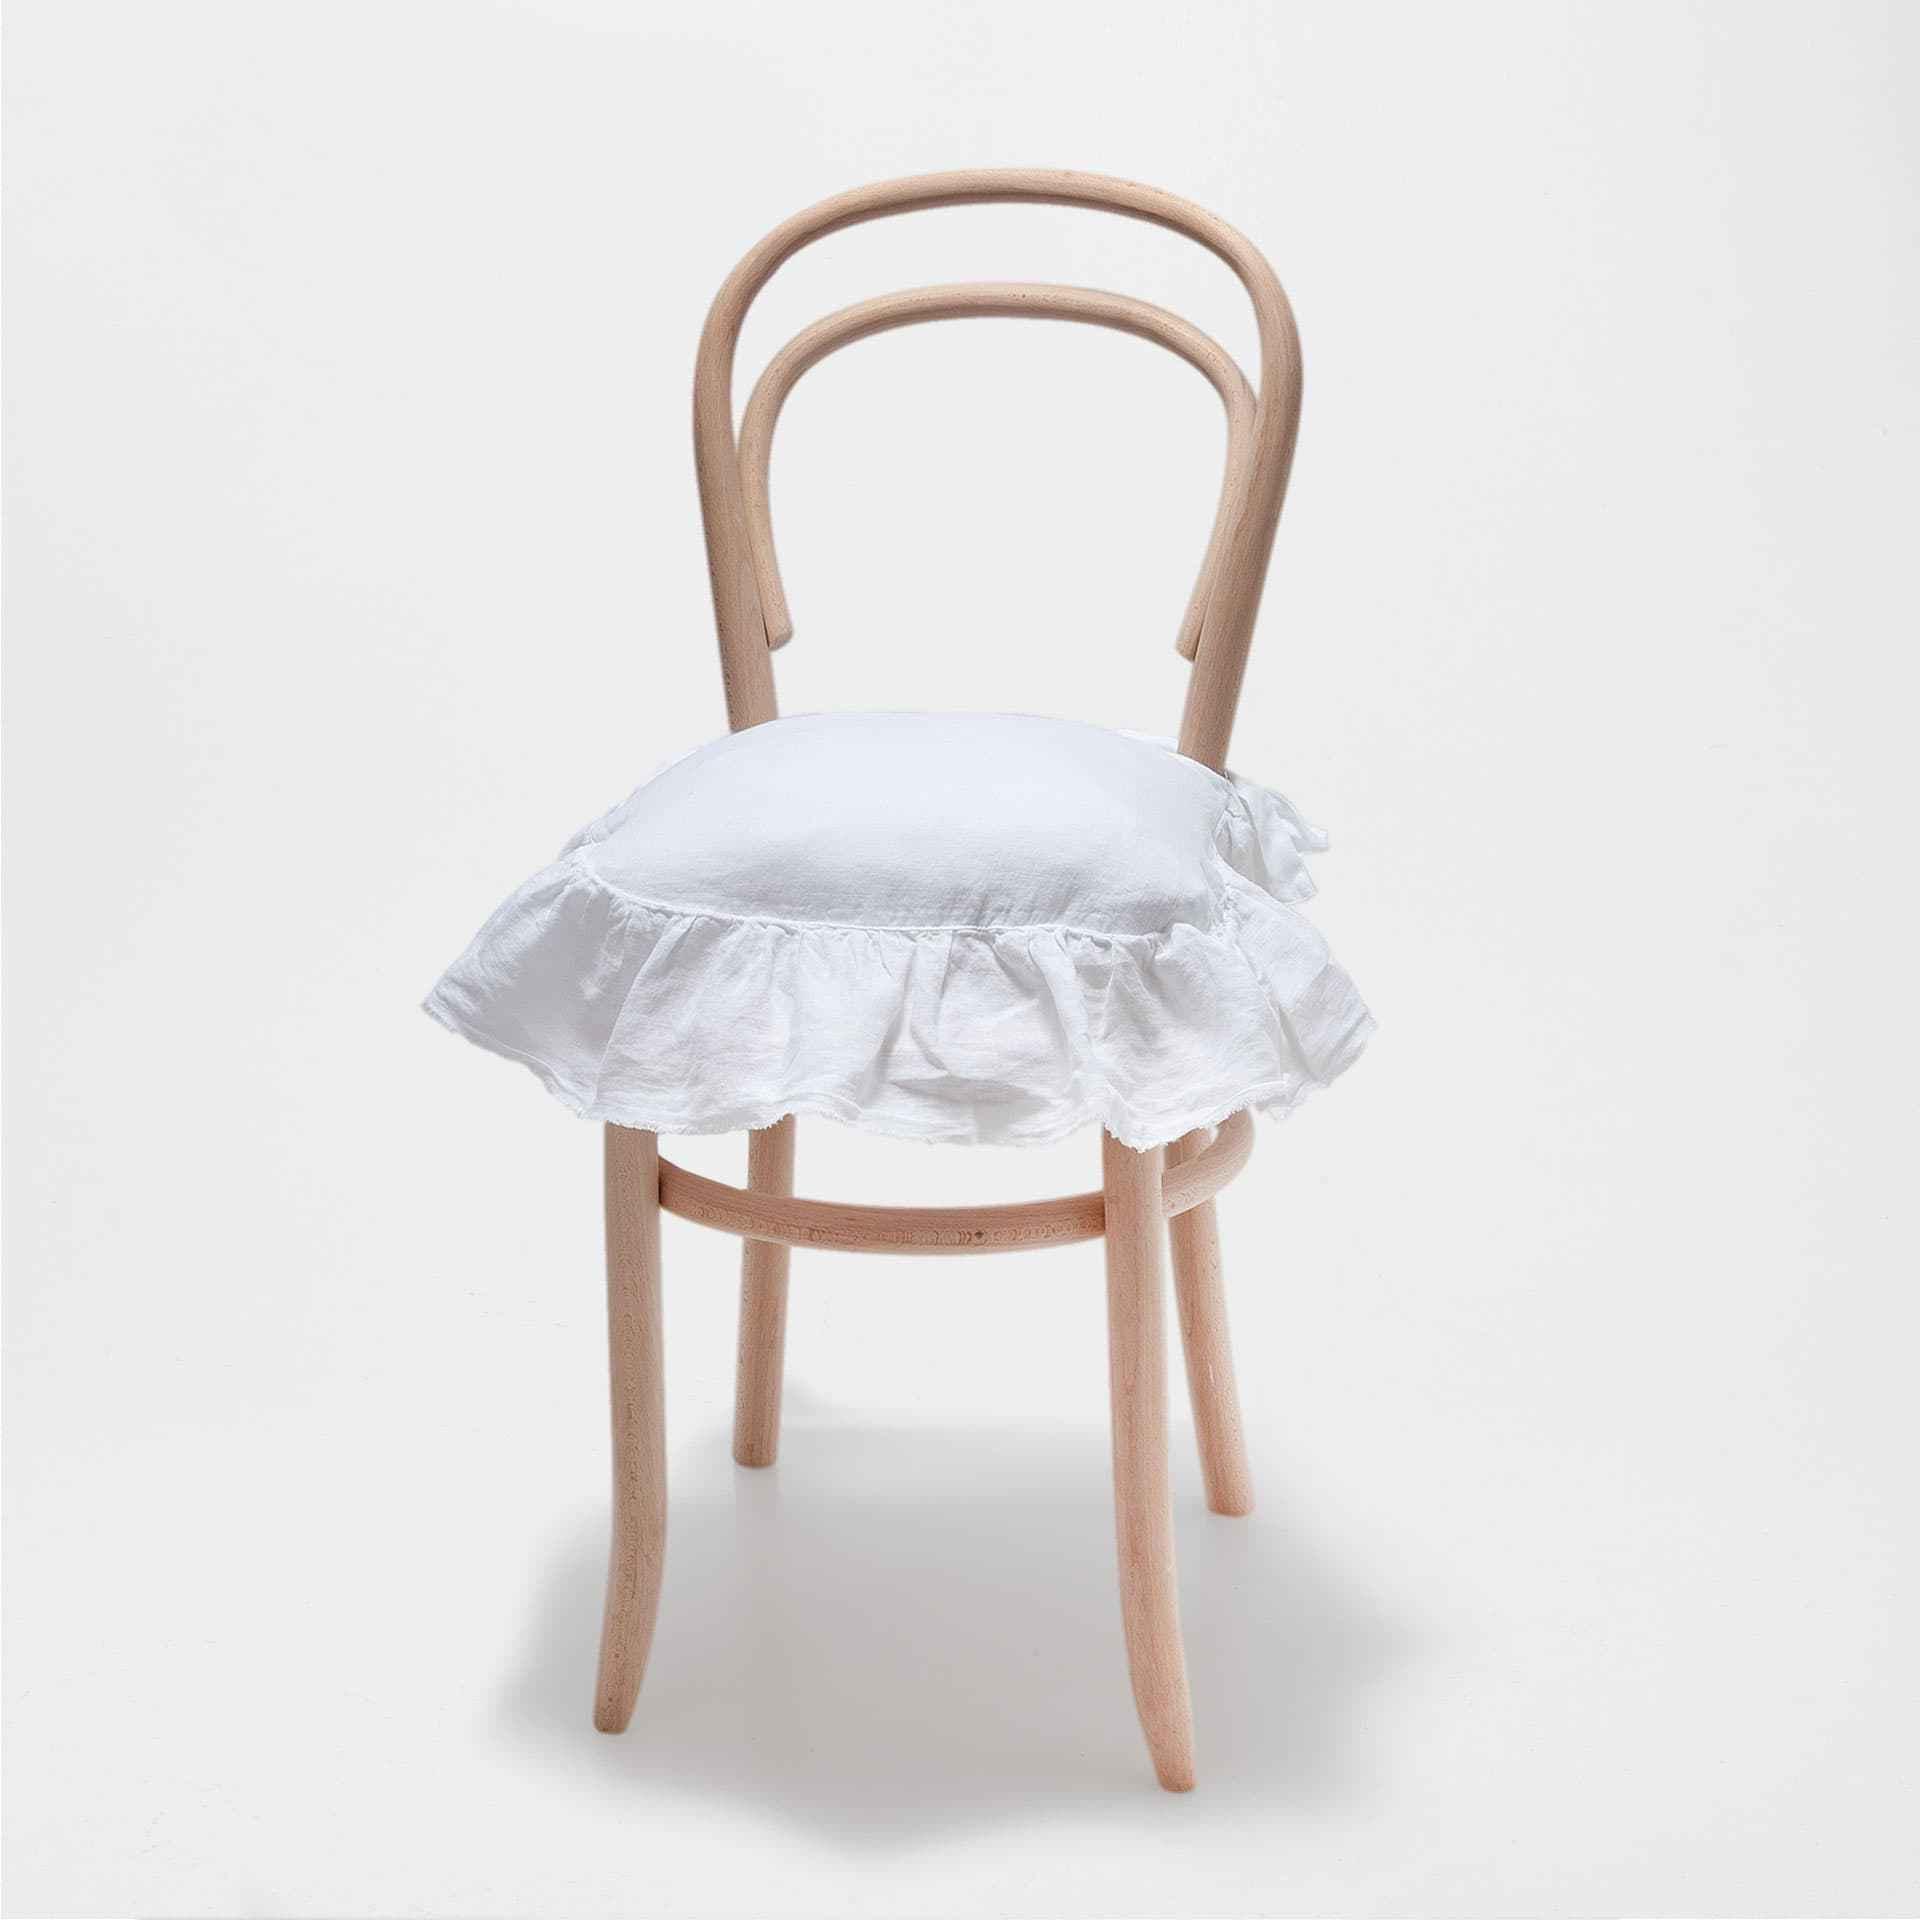 Fundas Sillas Comedor Zara Home 9ddf Fundas Sillas Edor Zara Home Fundas Sillas Edor Ikea